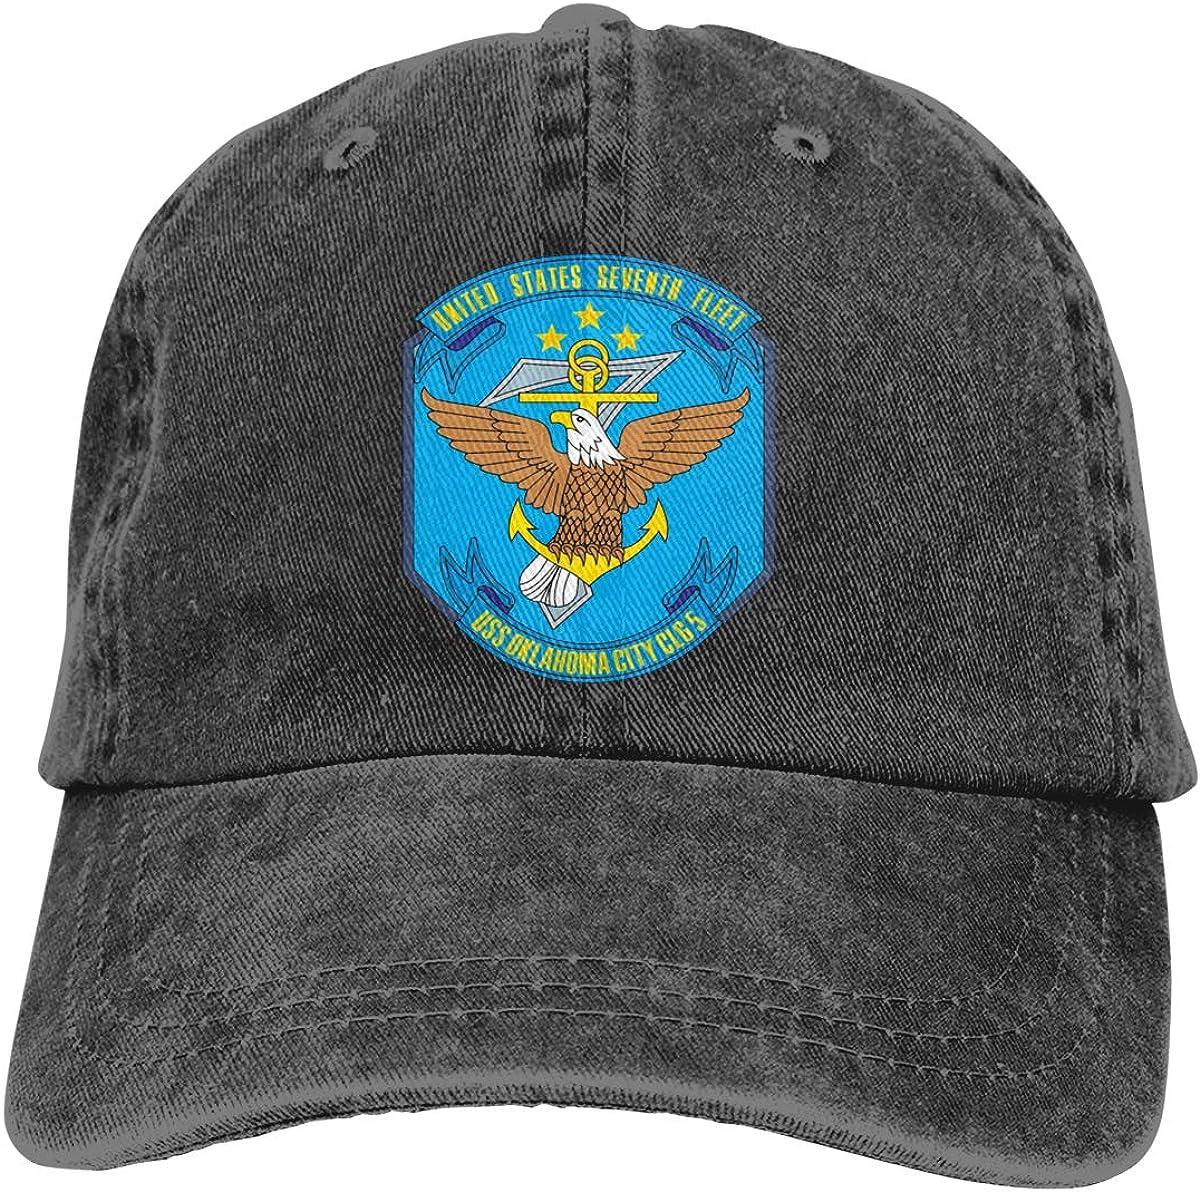 HUZEMINniu 7th Seventh Fleet Navy USS Oklahoma City CLG-5 Unisex Adult Baseball Hats Cowboy Hats Denim Hats Dad Hat